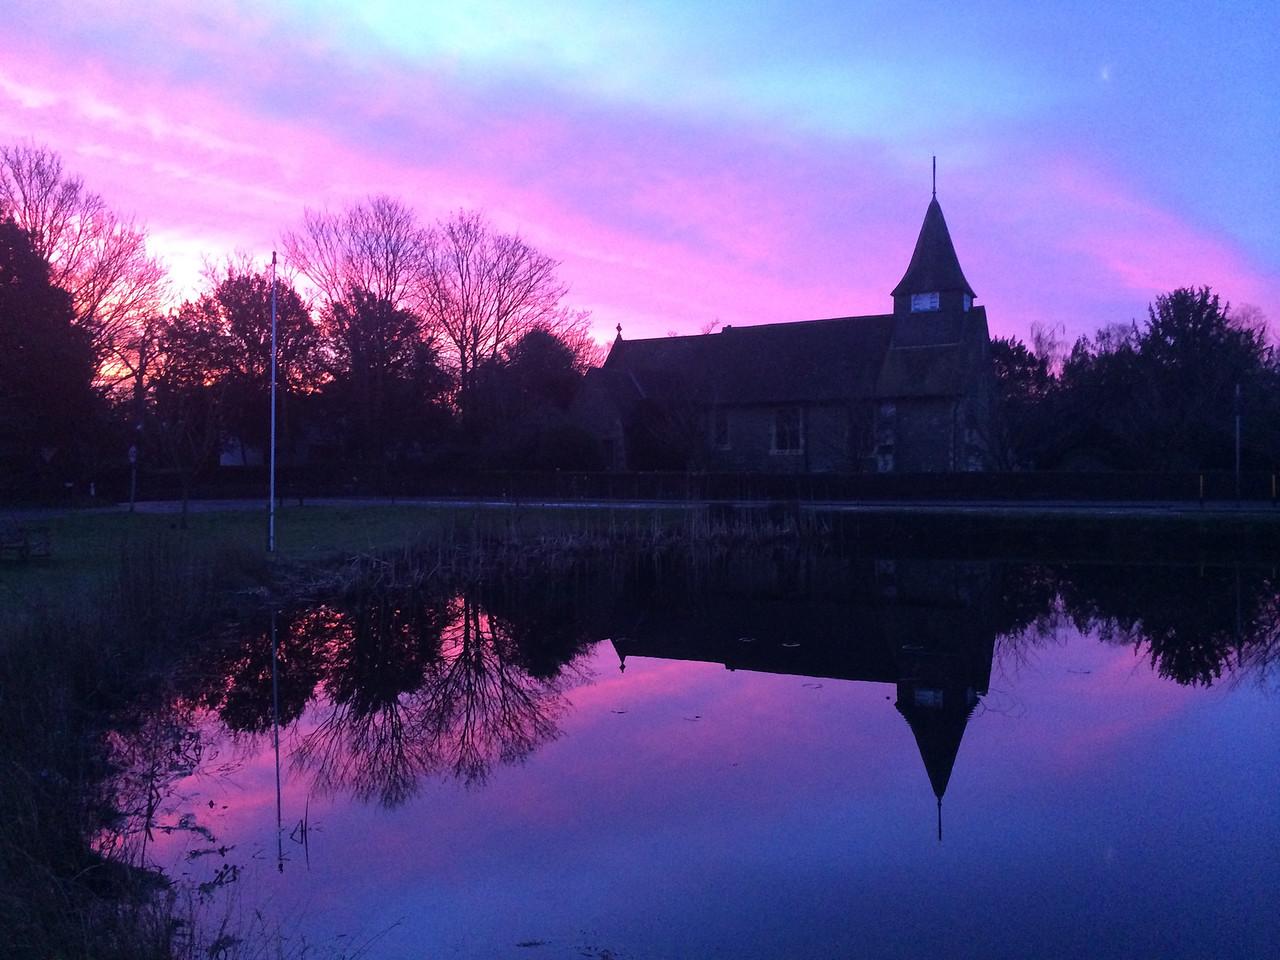 Sunrise over Buckland, Surrey, England